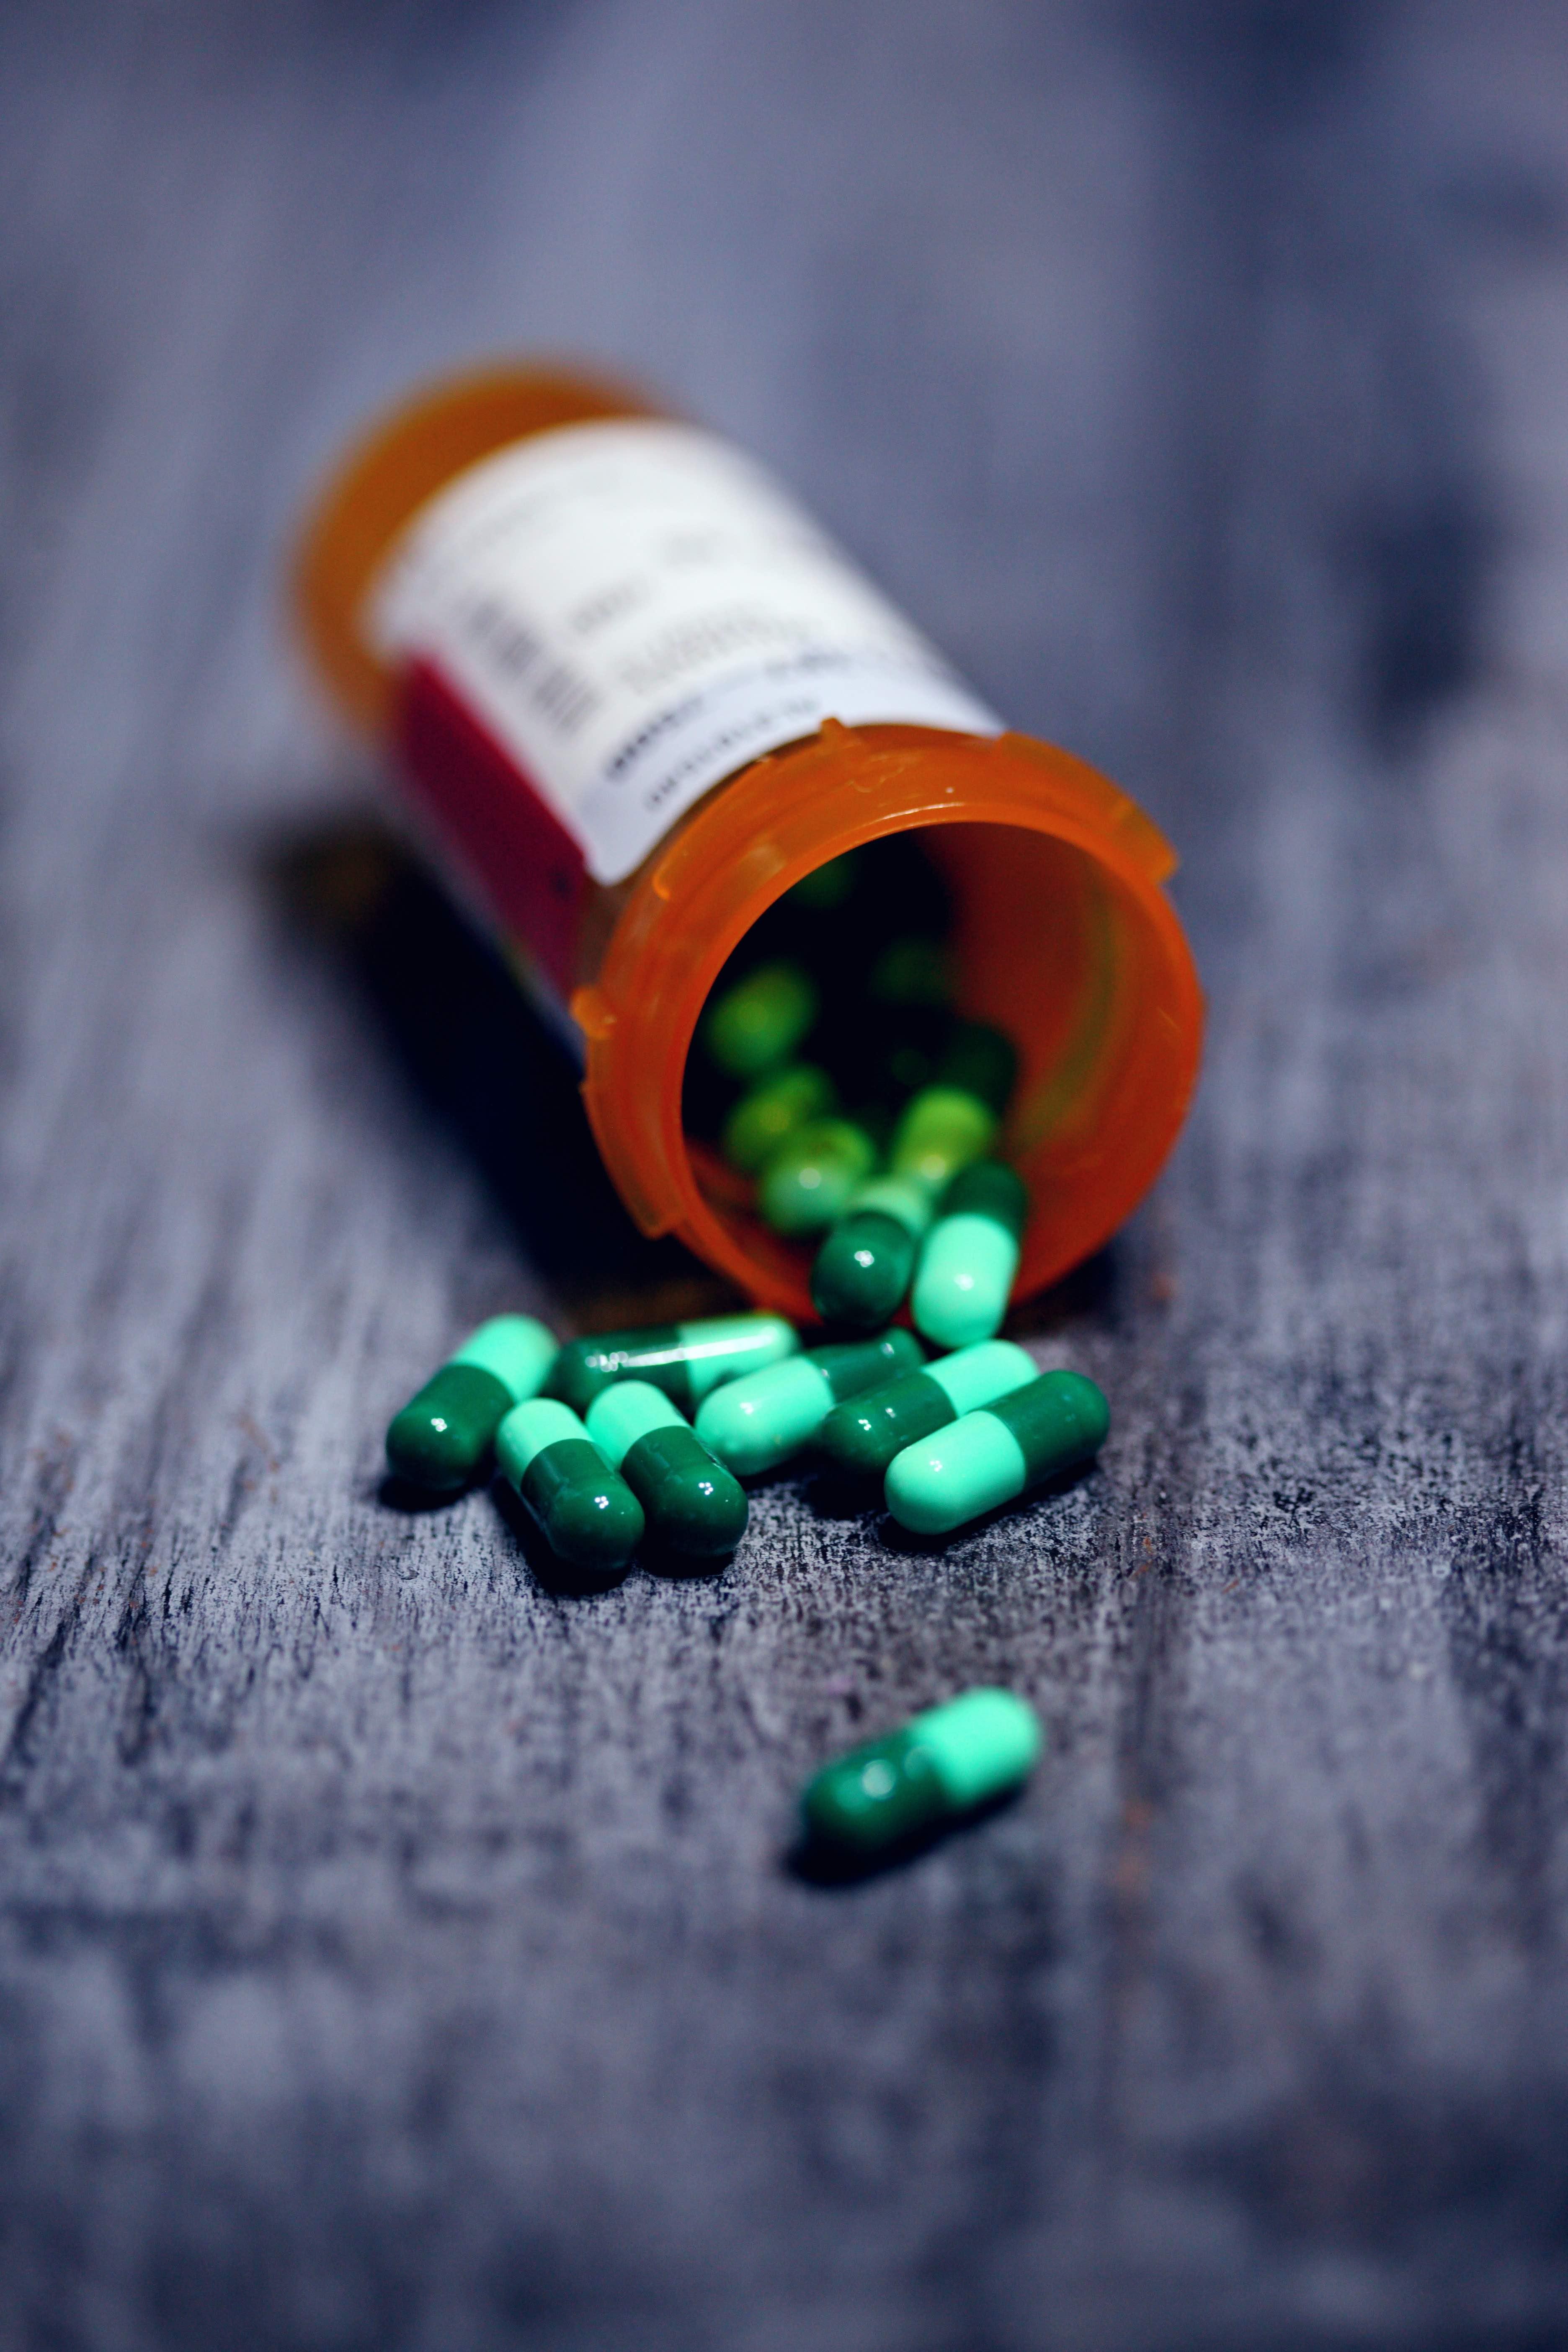 adhd medication pills